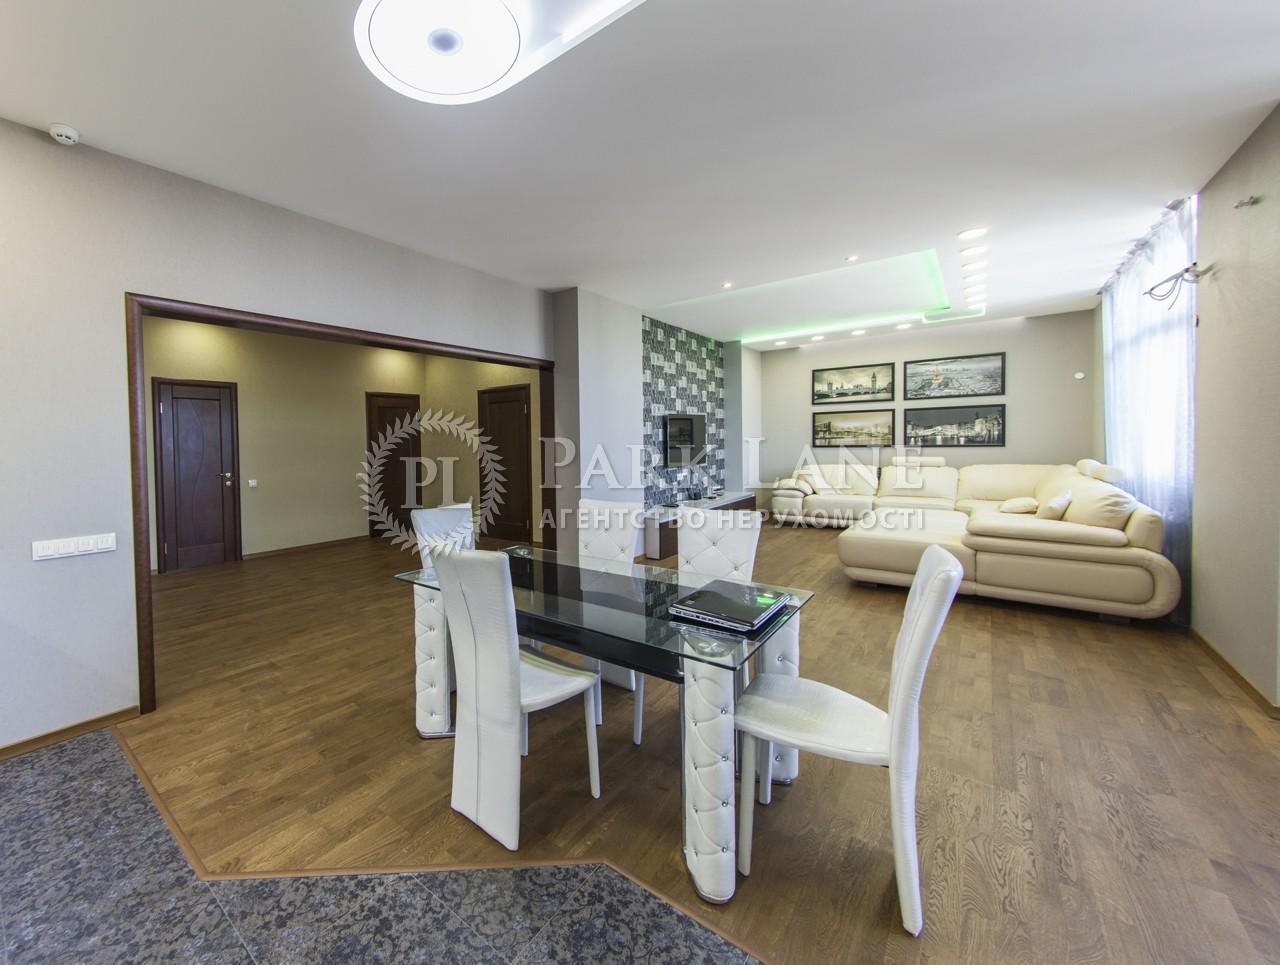 Квартира ул. Глубочицкая, 32б, Киев, K-22263 - Фото 7